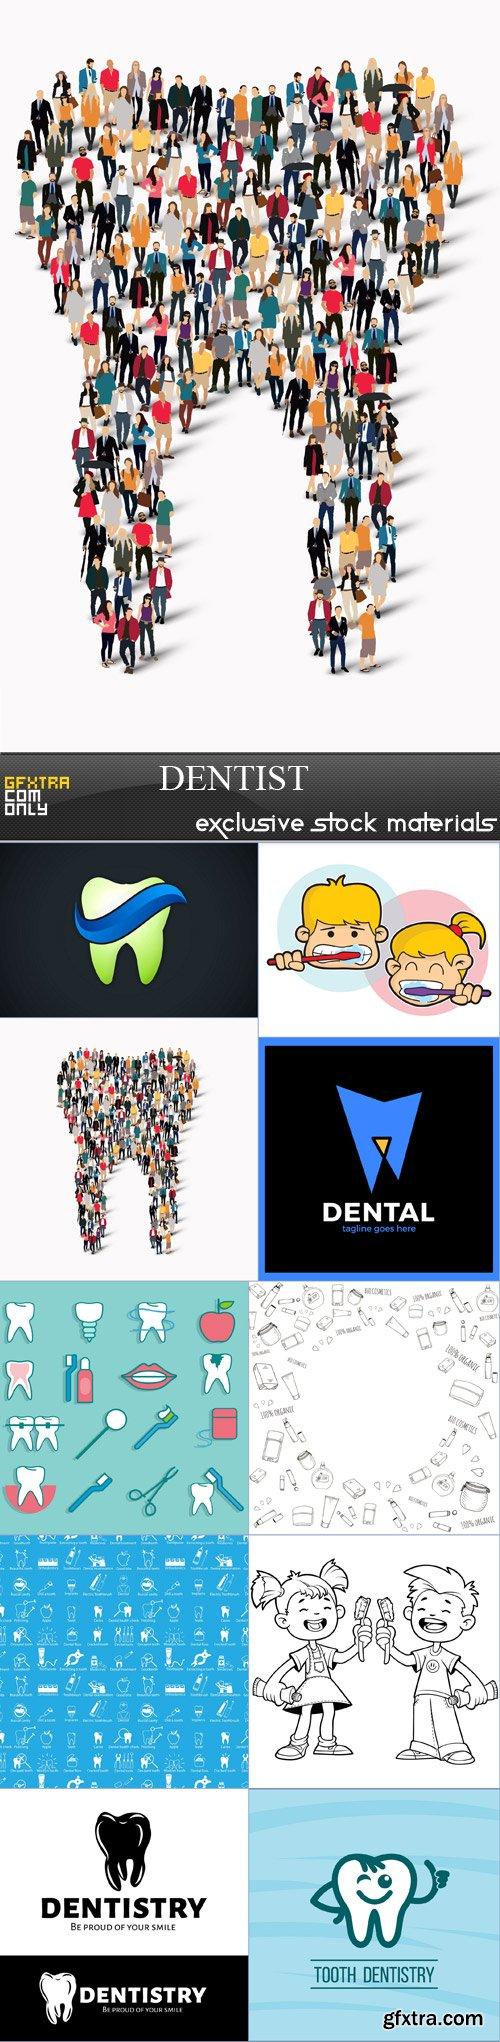 Dentist - 10 EPS